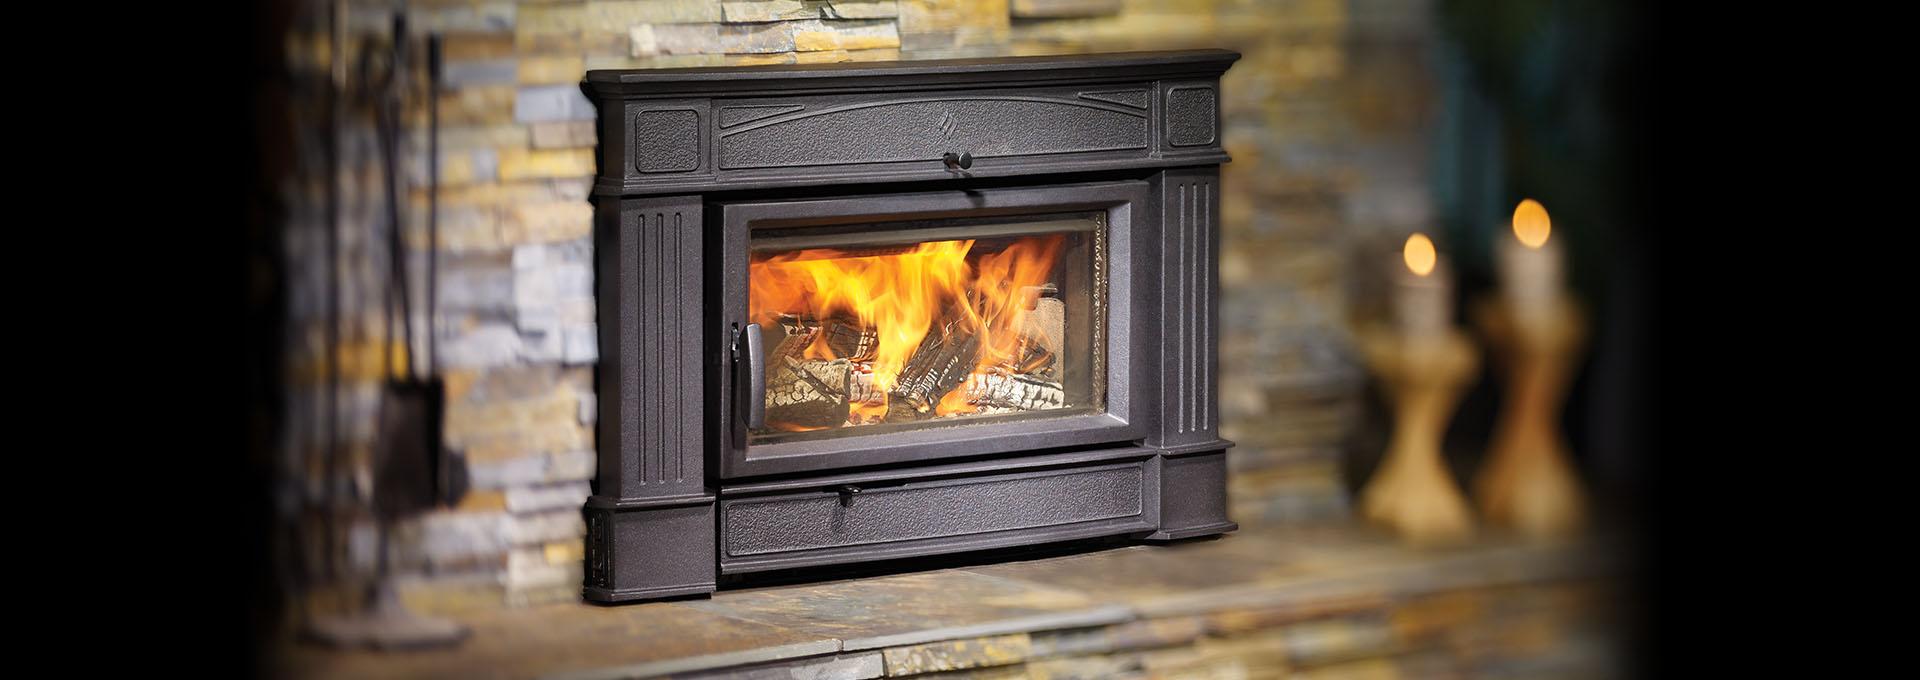 hi400 hampton large hybrid catalytic wood insert wood fireplace